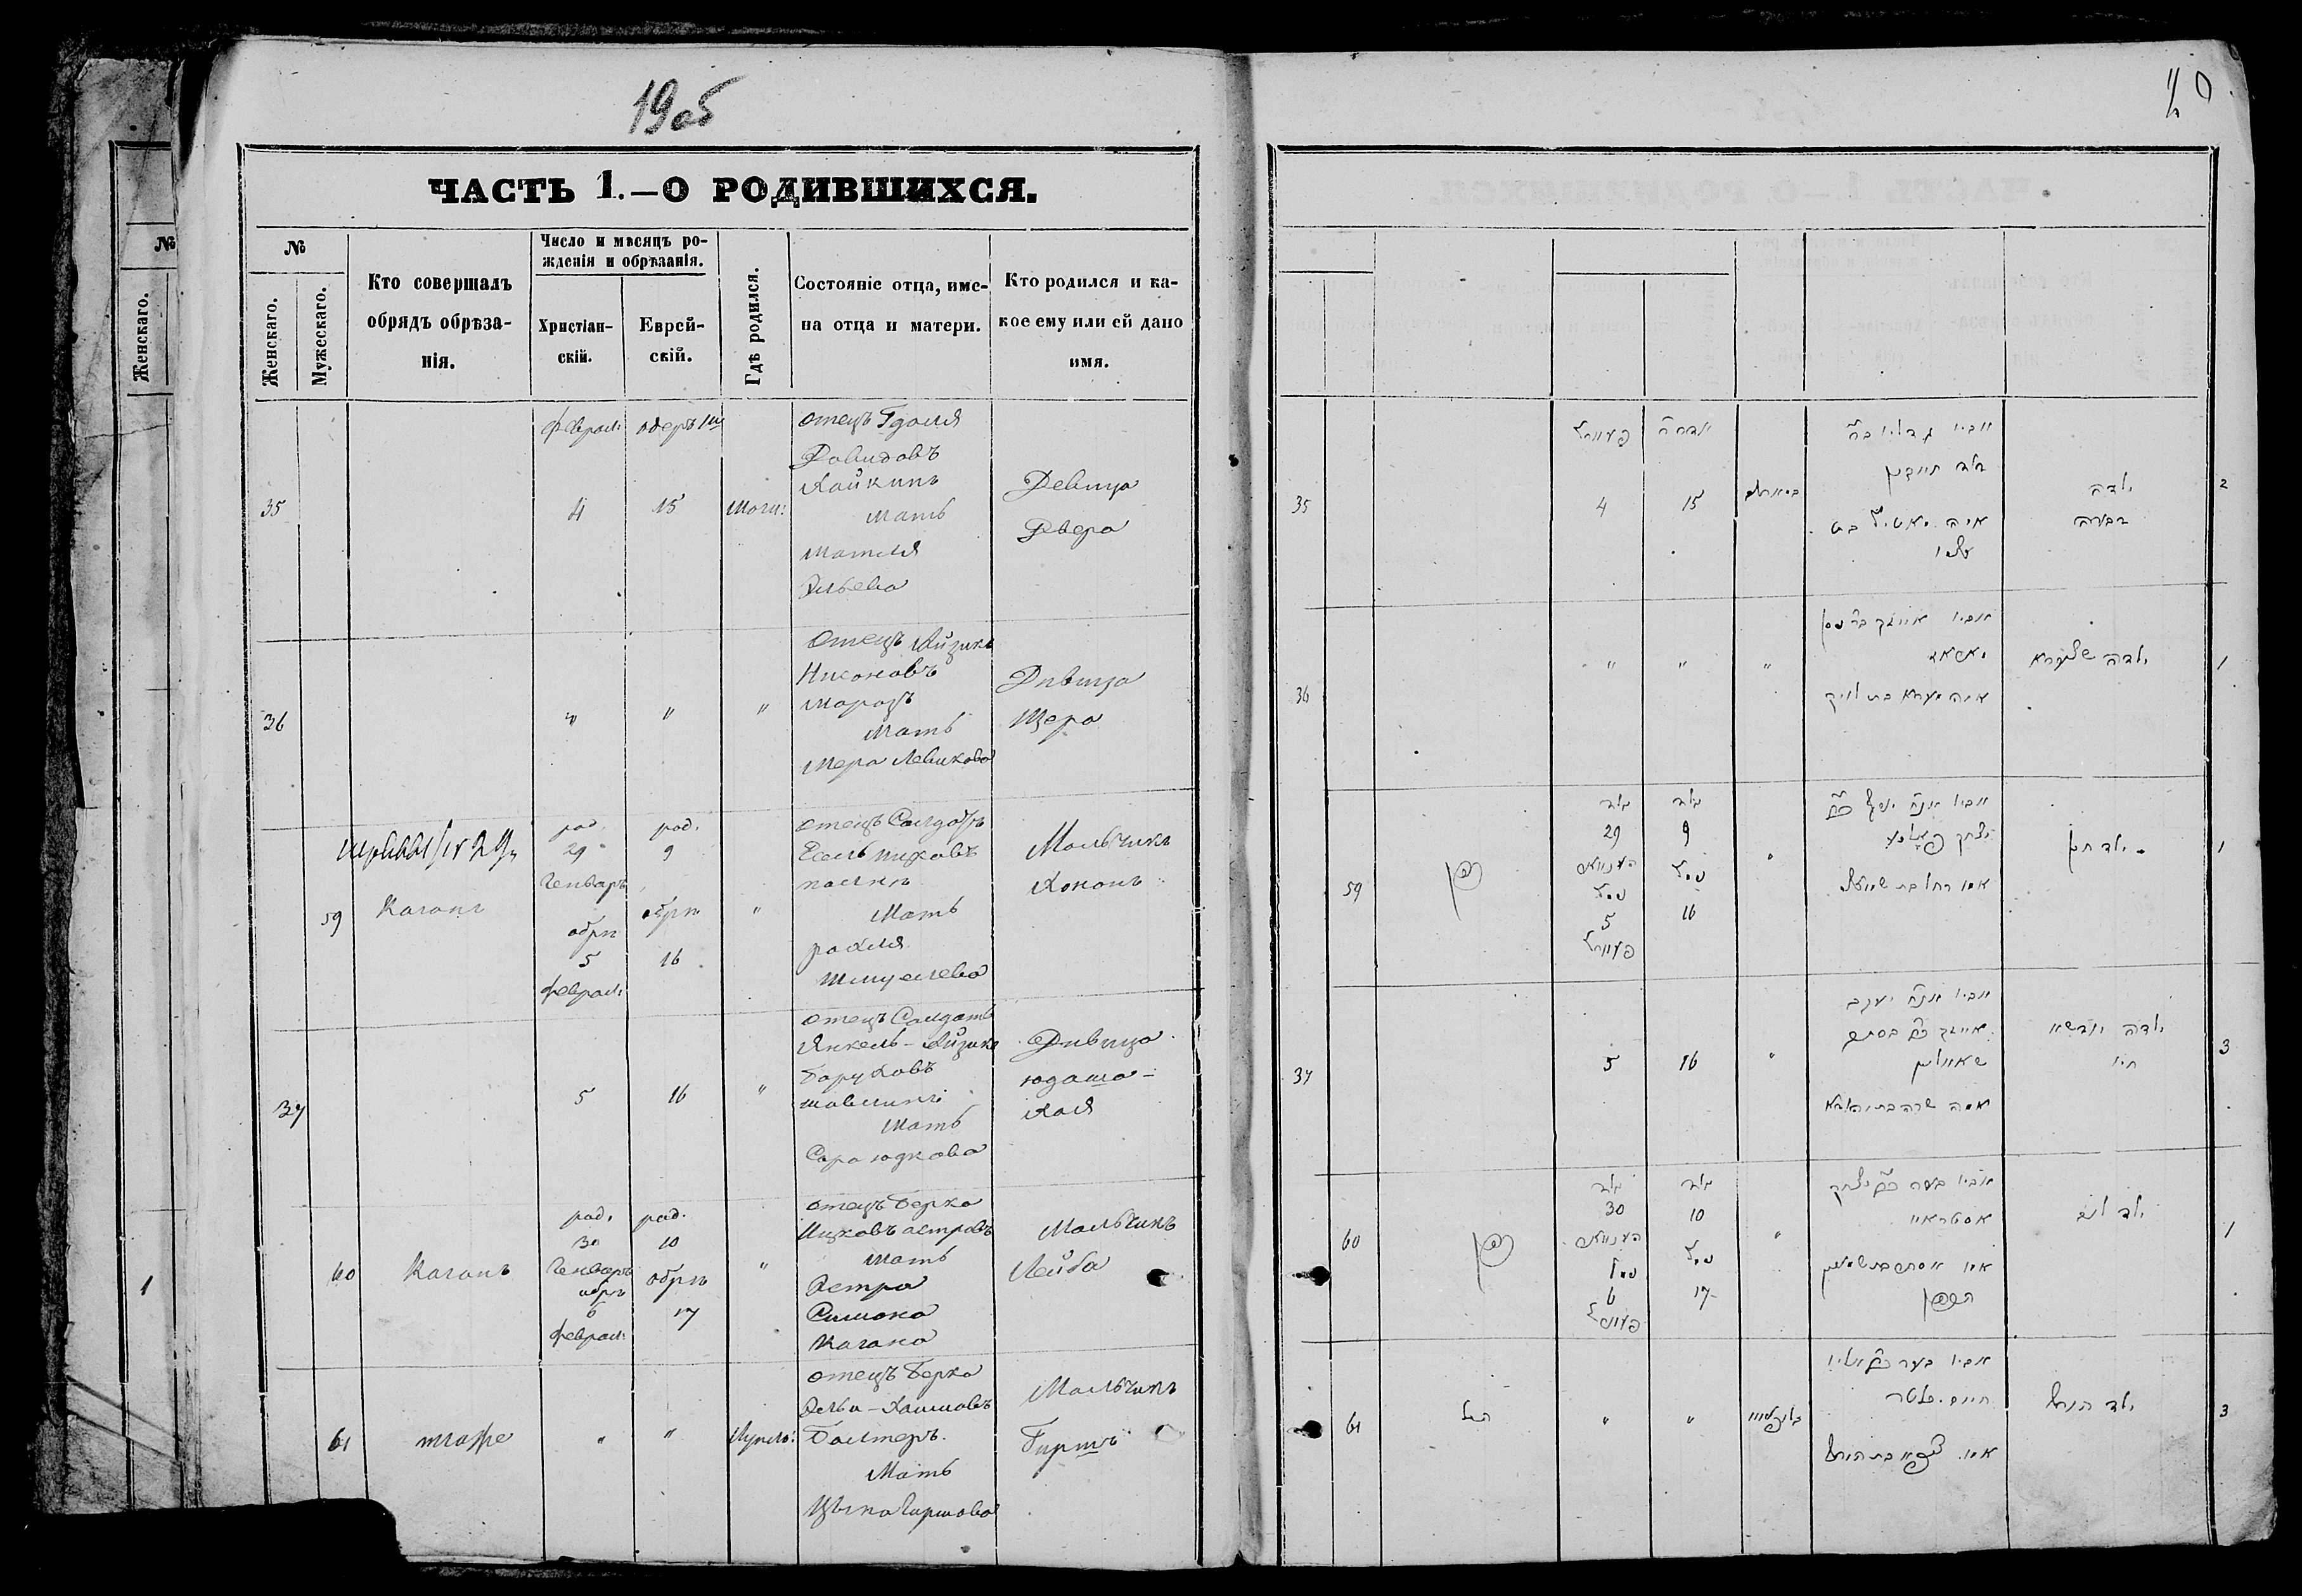 Лейба Беркович Остров 30 января 1870, запись 60, пленка 007766480, снимок 601